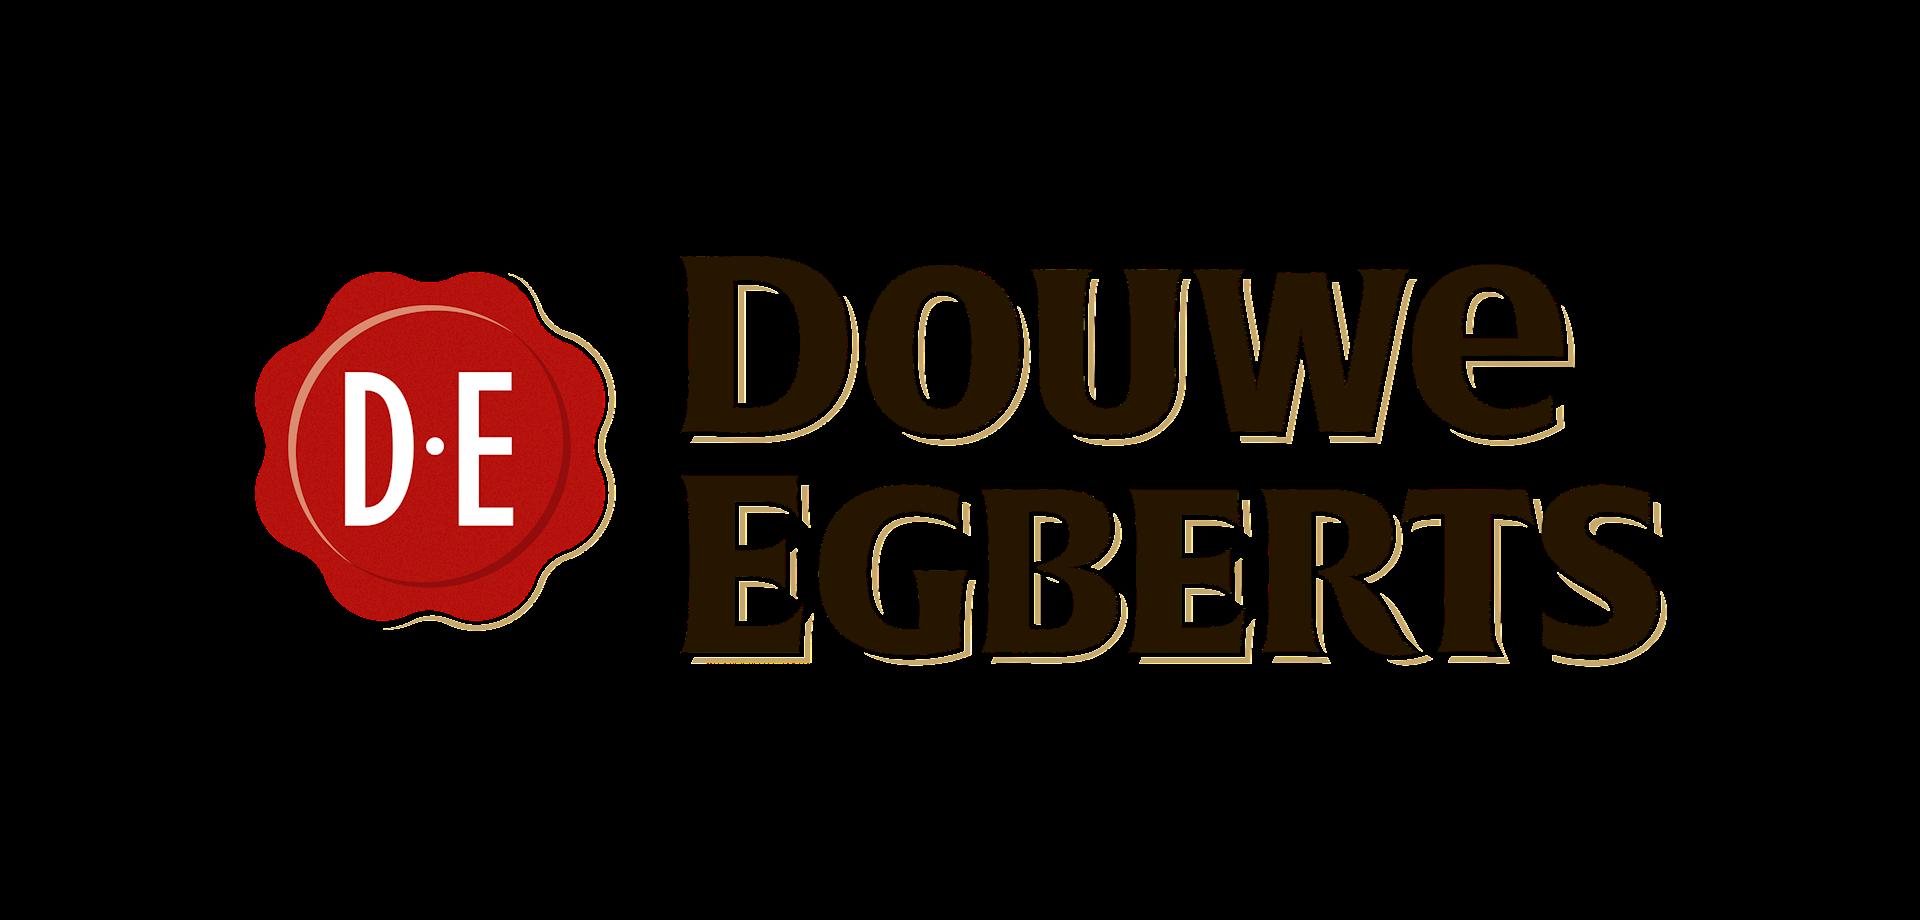 Merkafbeelding DOUWE EGBERTS AROMA VARIATIES